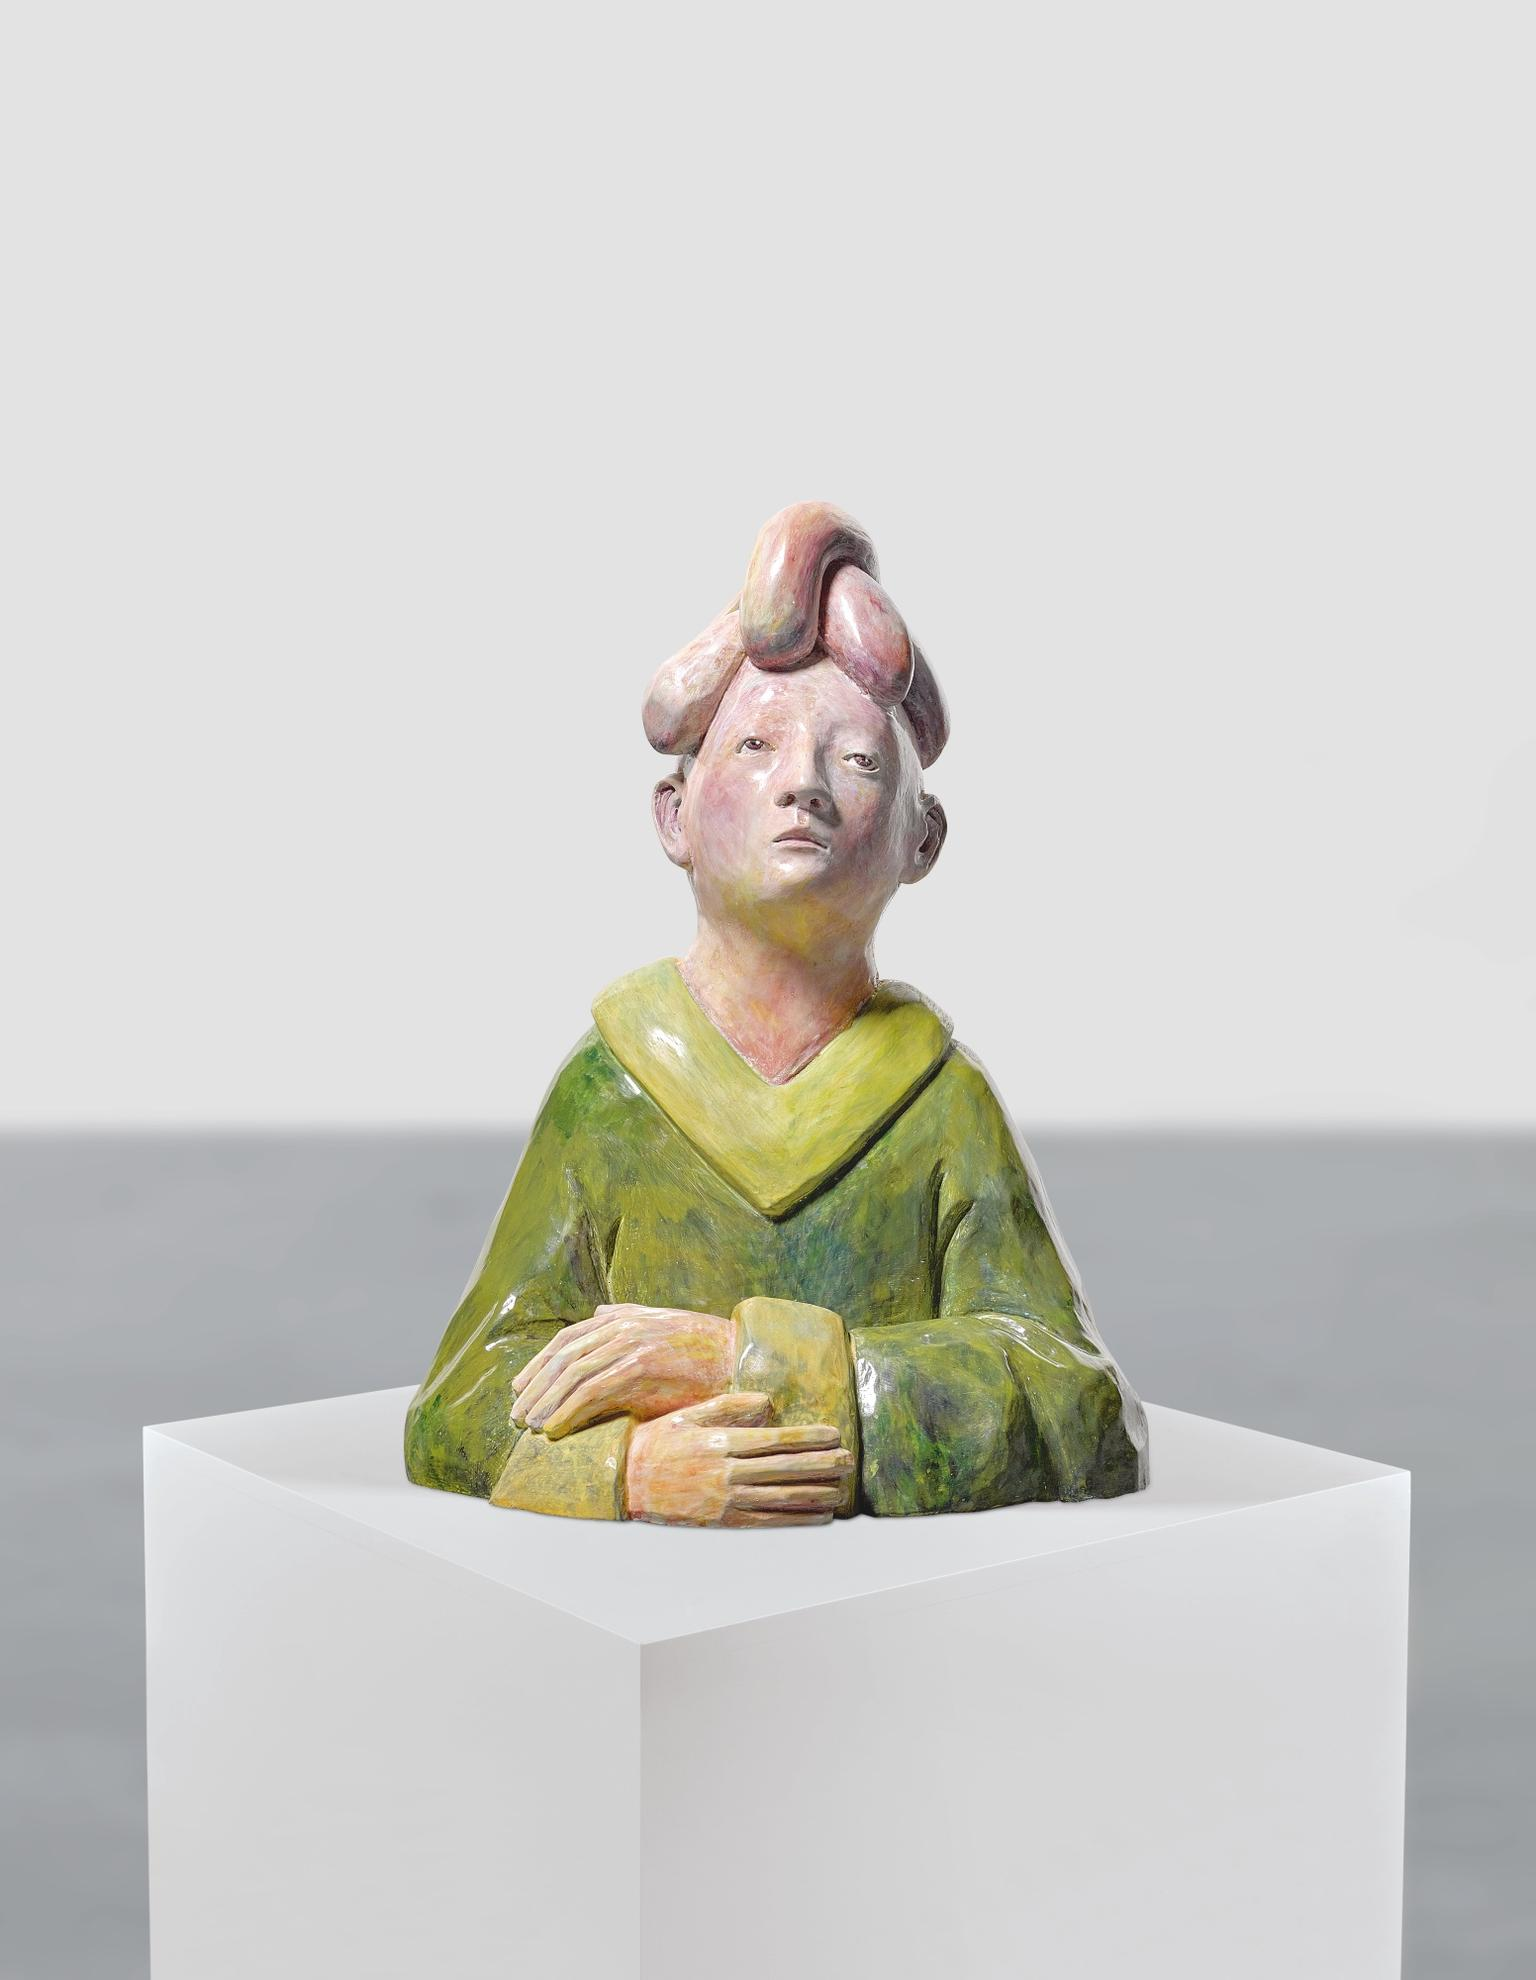 Paloma Varga Weisz-Wurstkopfman-2005